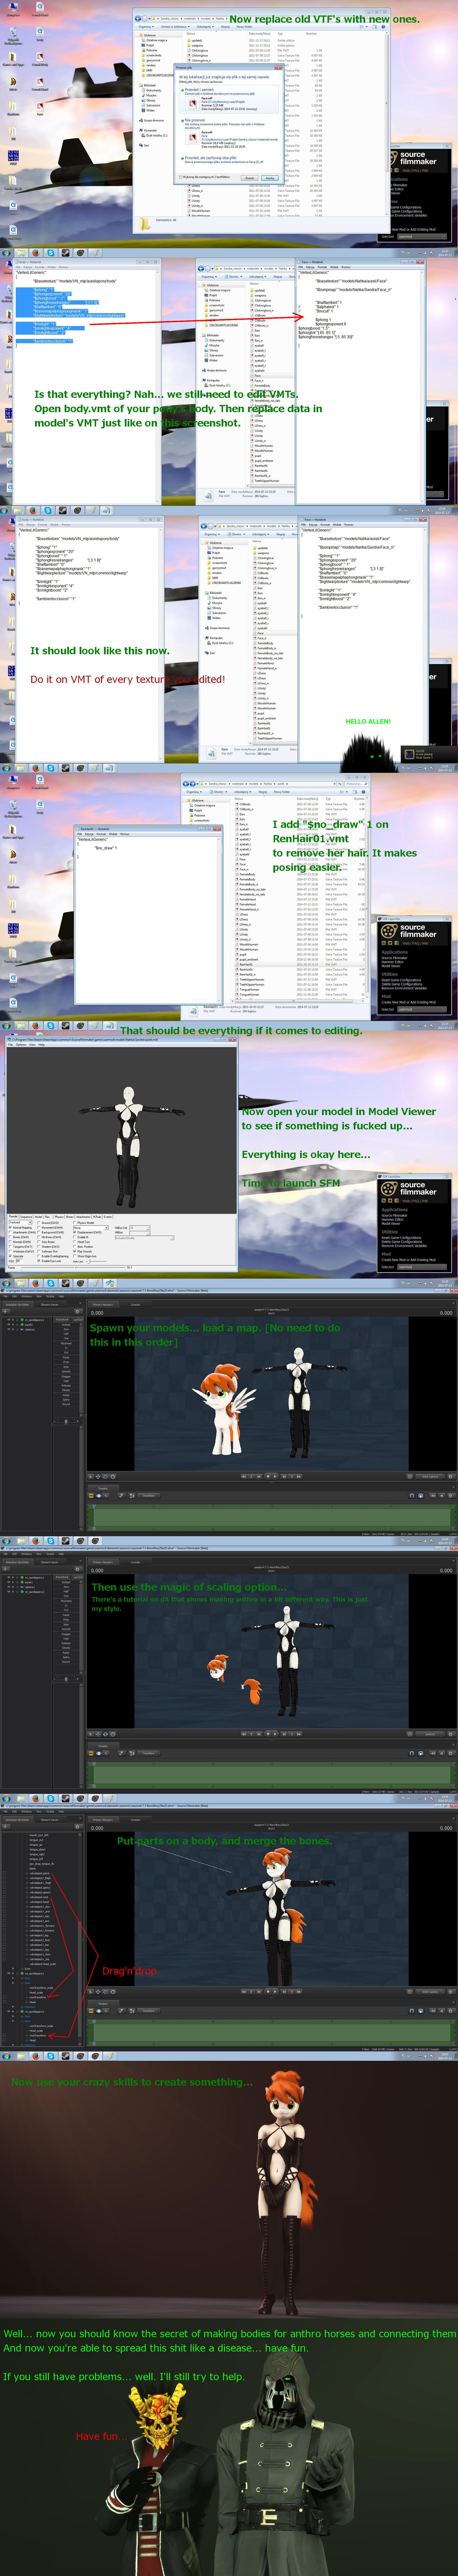 Good sfm tutorials favourites by uponia on deviantart dafuqer7 37 15 tutorial anthro ponies part 2 by narox22 baditri Gallery